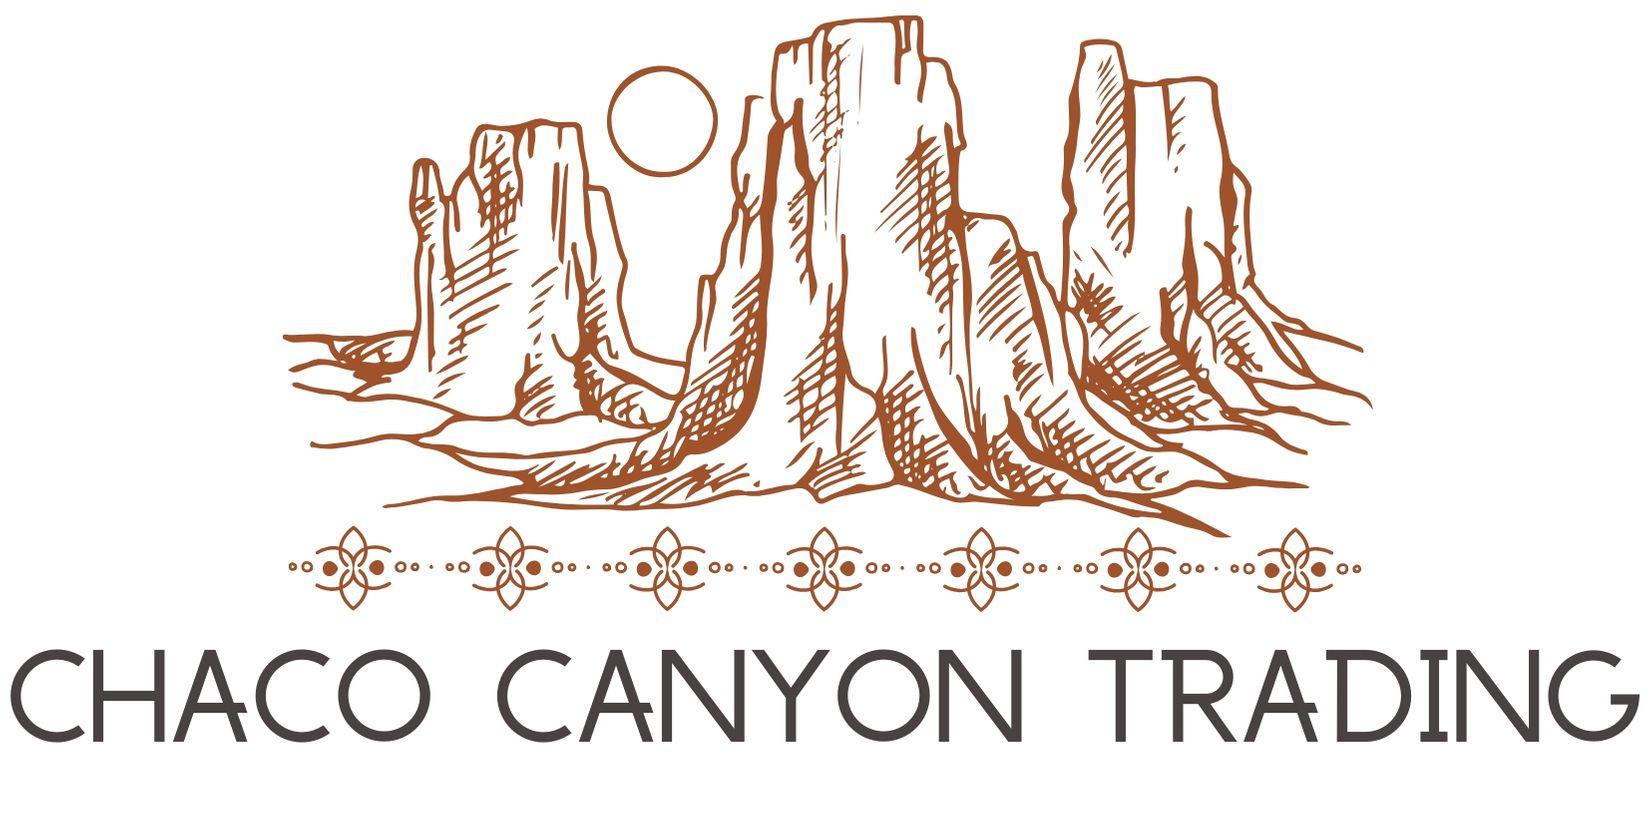 CHACO CANYON TRADING